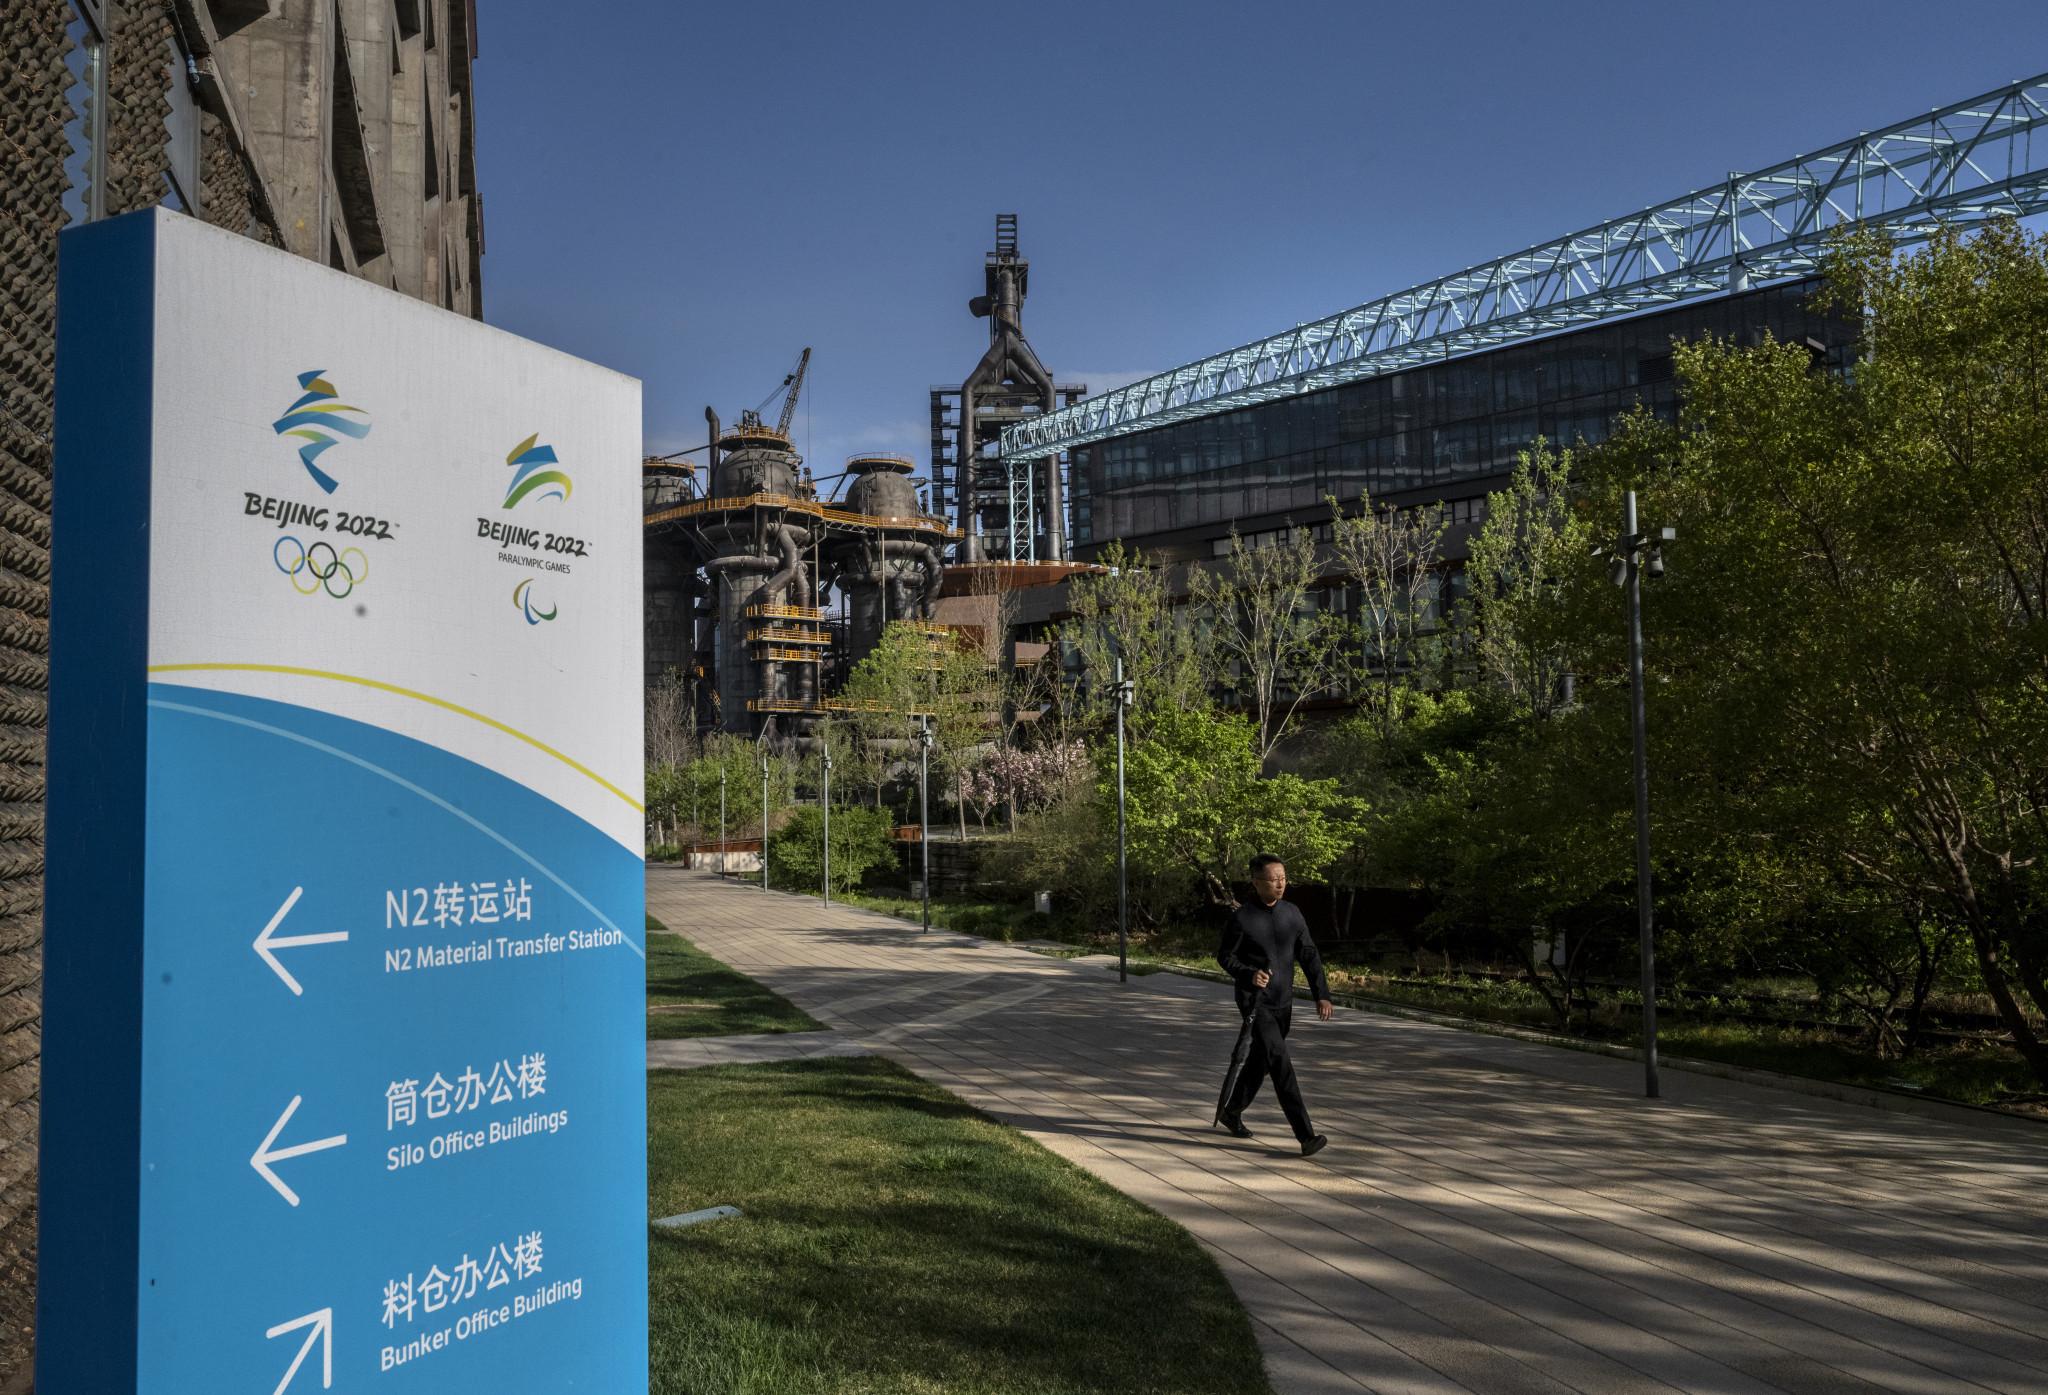 Shanghai Cooperation Organisation offer support to Beijing 2022 on visit